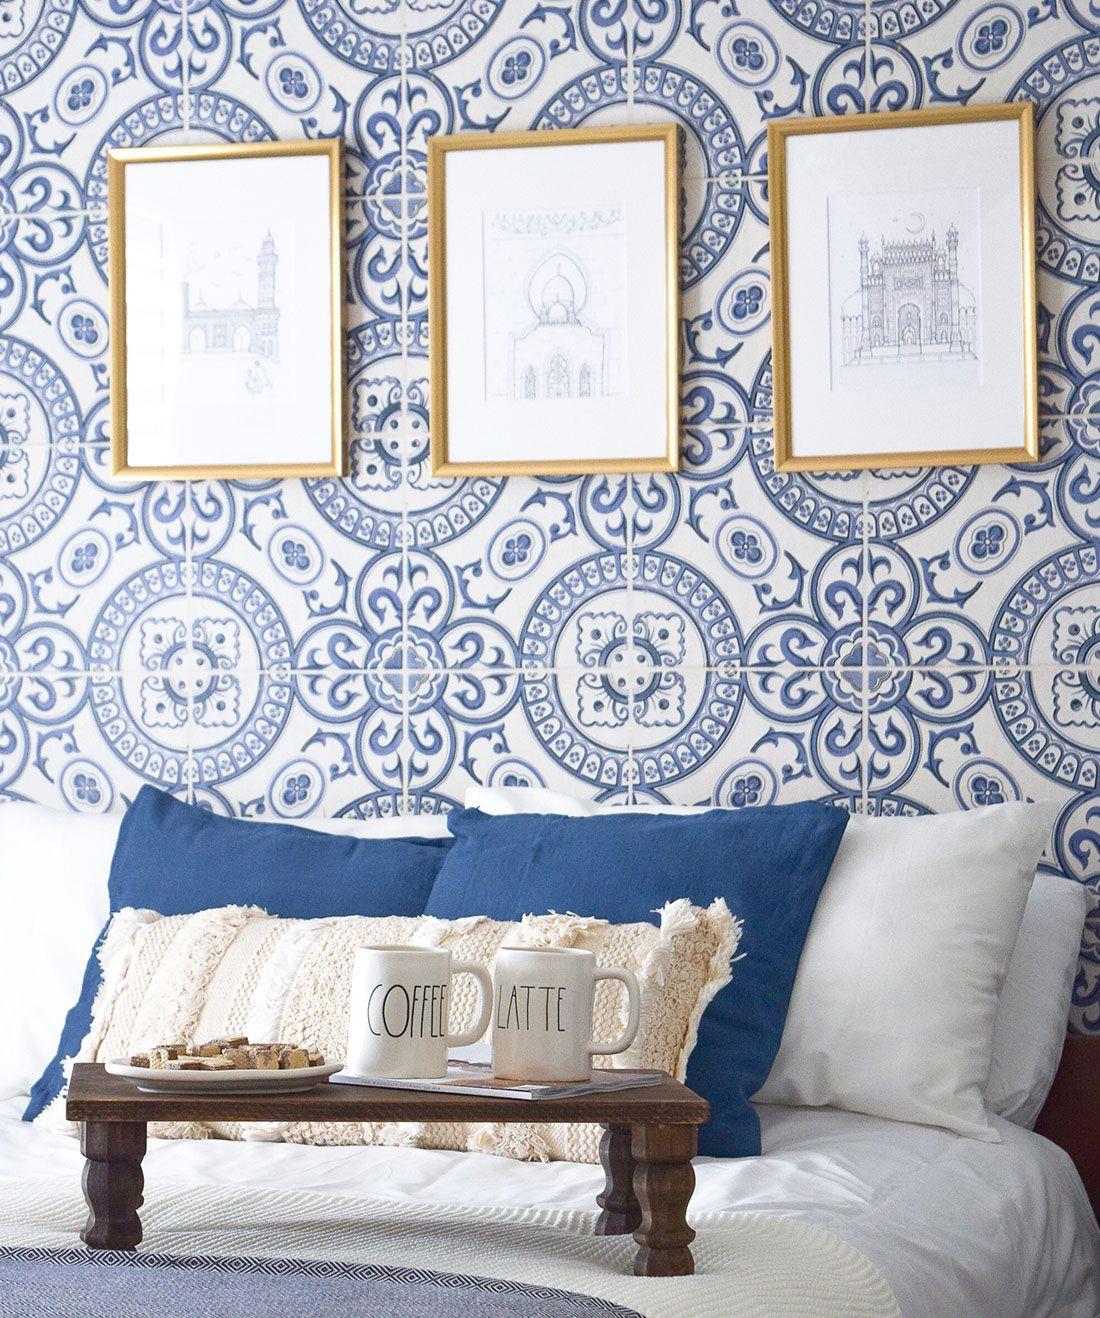 Heritage Tiles Wallpaper Authentic Cement Tile Design Milton King Blue Wallpaper Bedroom Tile Wallpaper Statement Wallpaper Bedroom